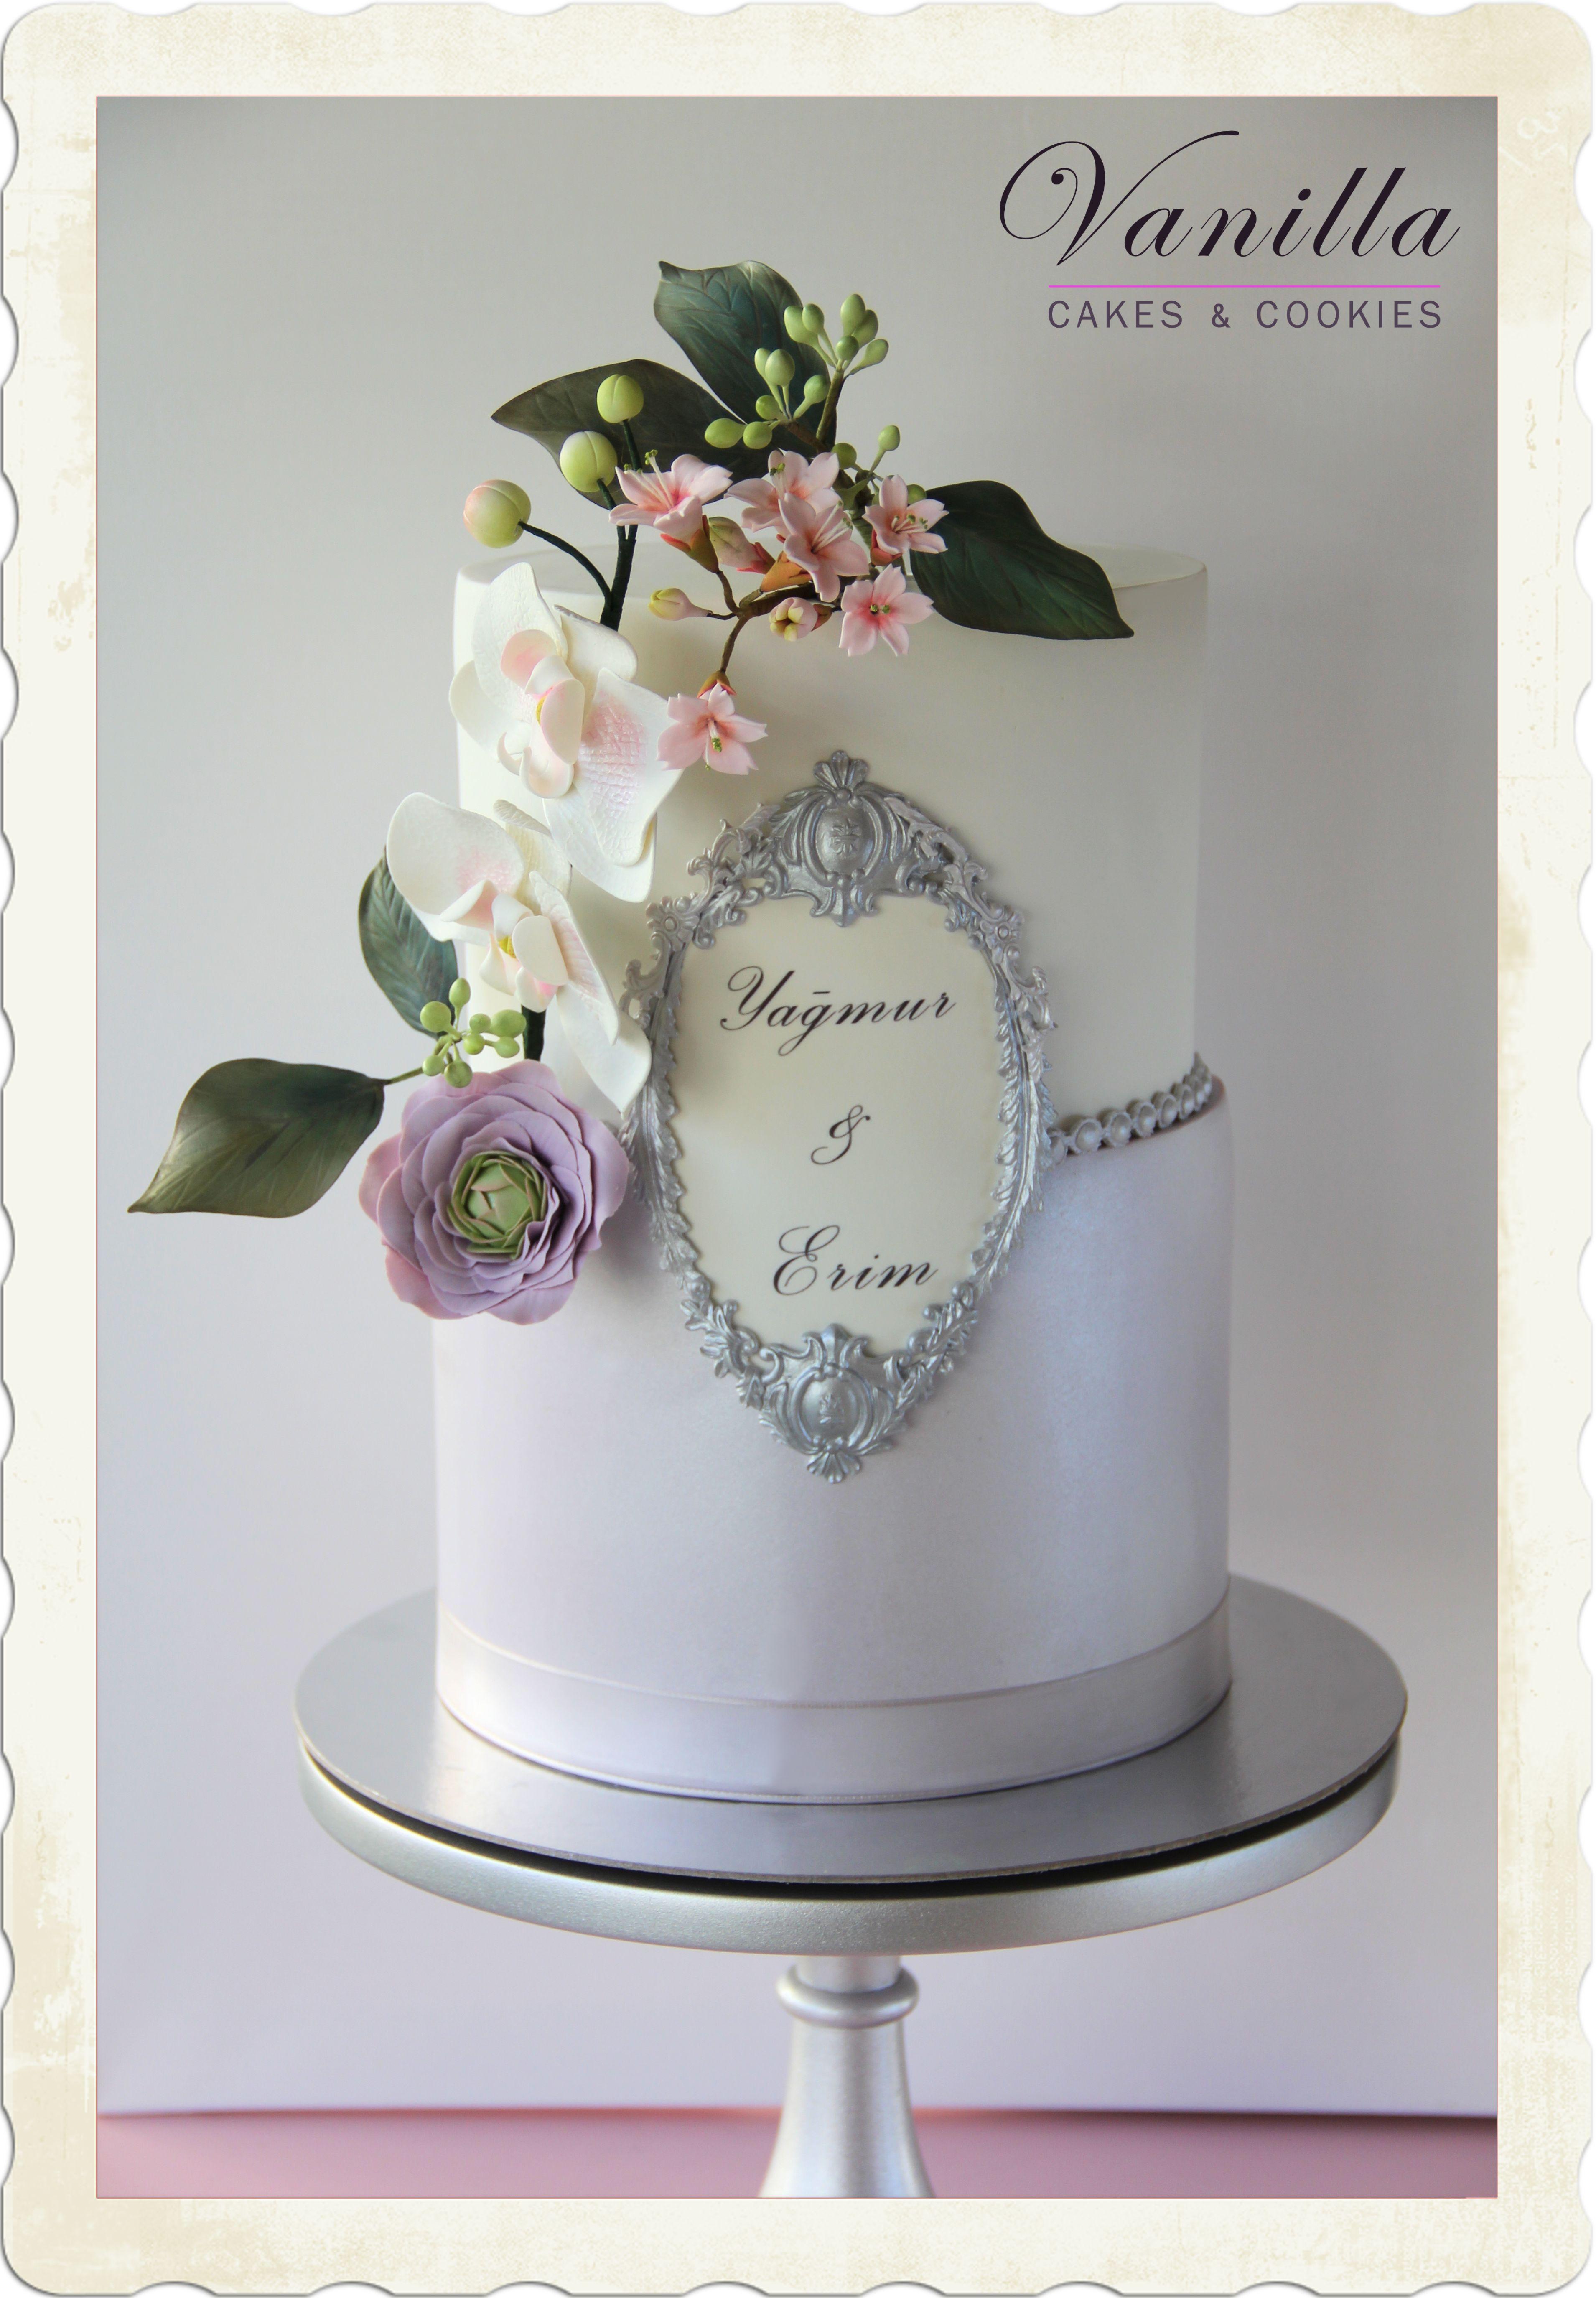 Engagement cake with gumpaste flowers nian pastas eker hamuru engagement cake with gumpaste flowers nian pastas eker hamuru iekli nian pastas wedding izmirmasajfo